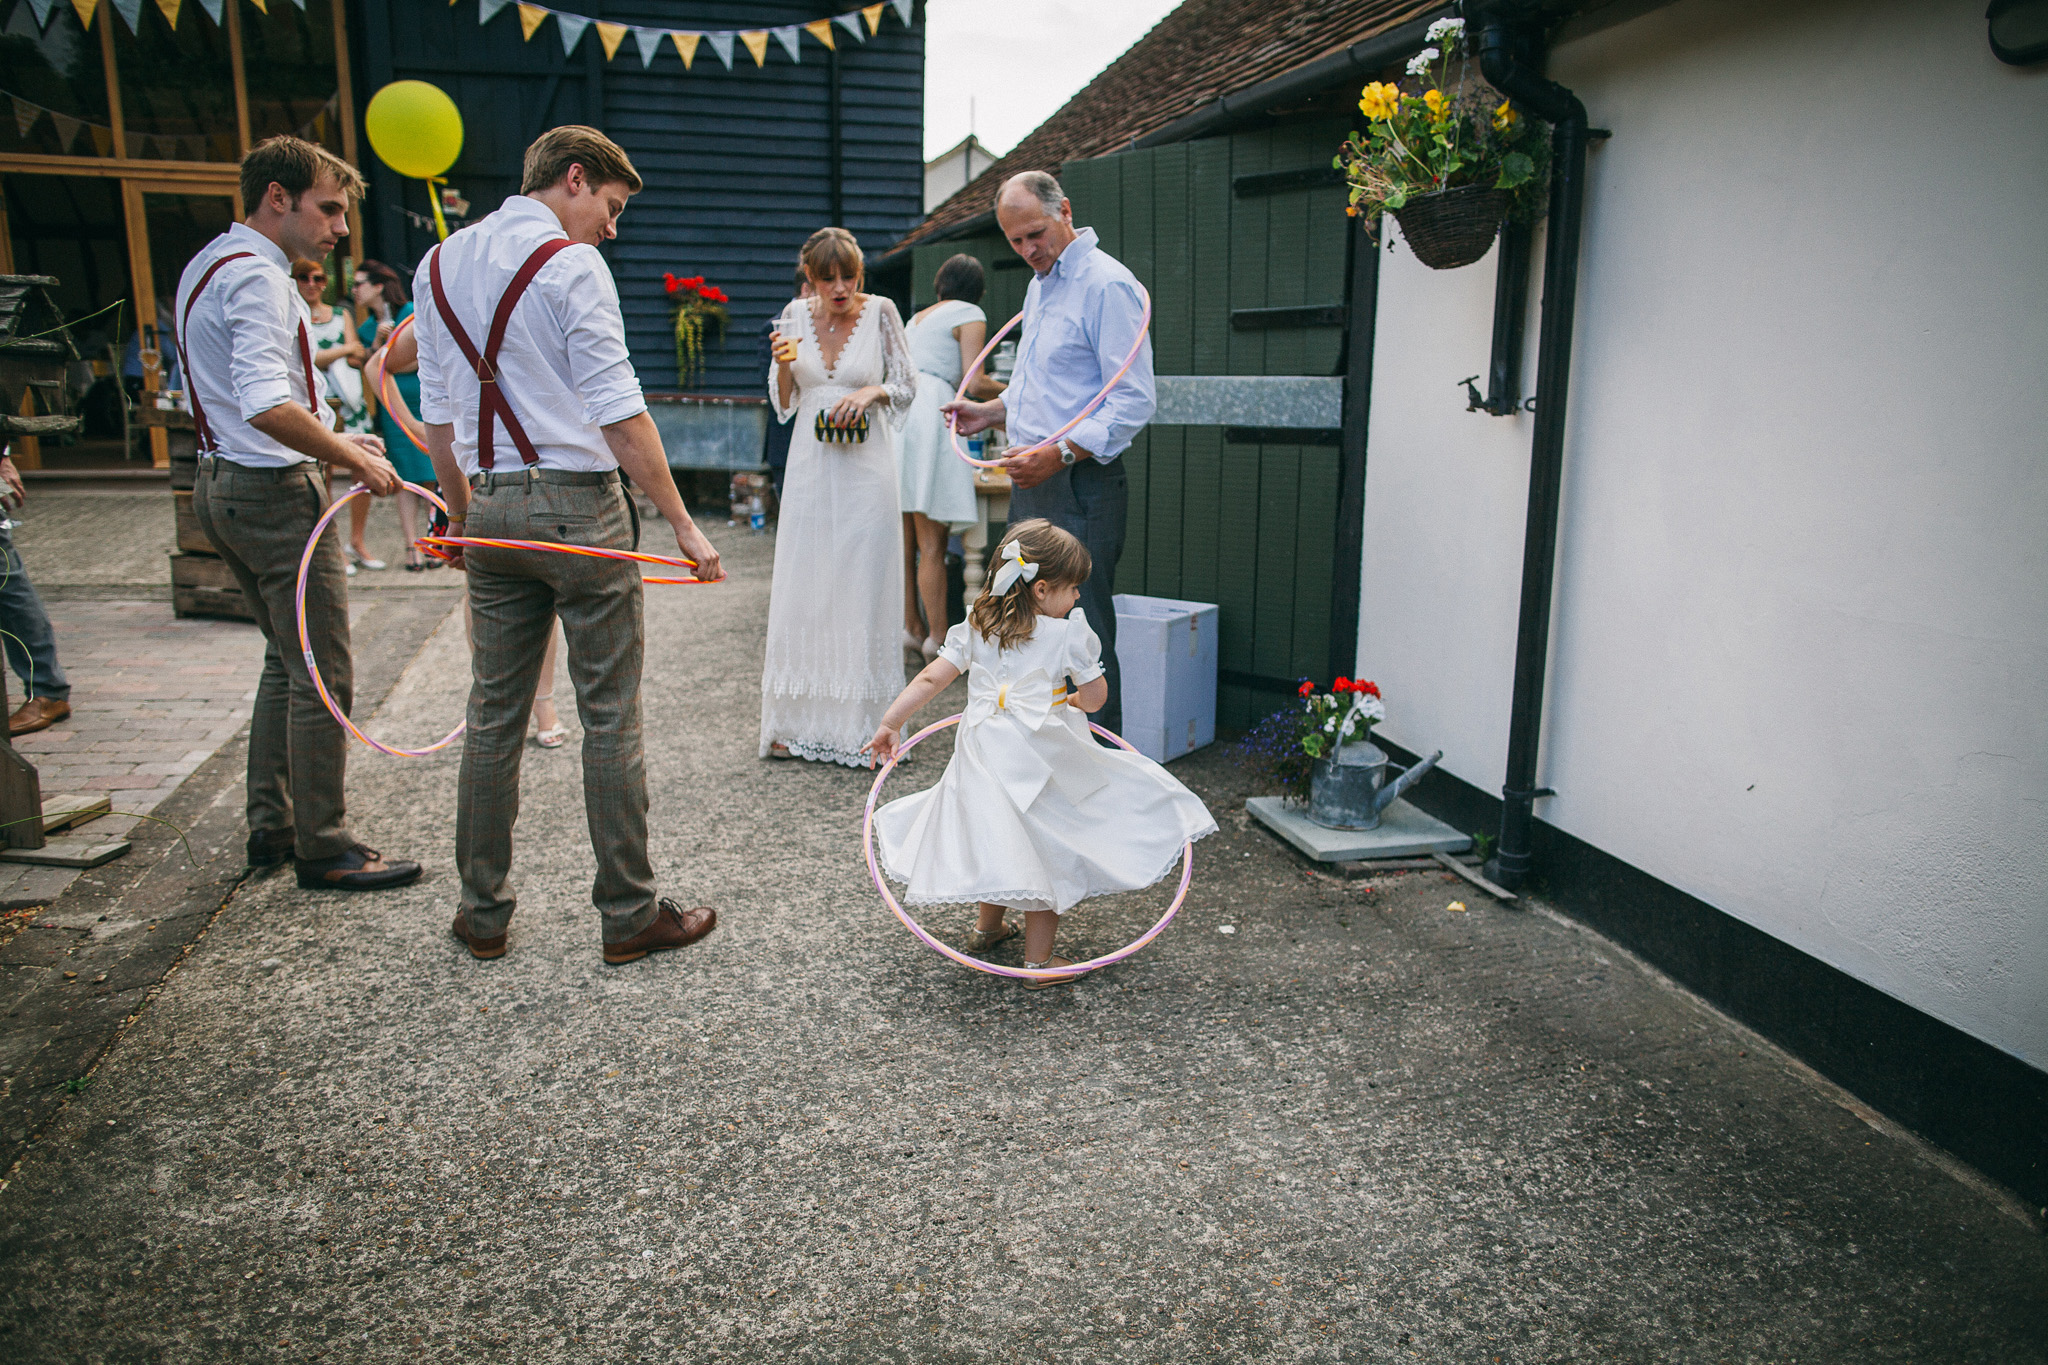 chantry_sussex_barn_wedding_342.jpg